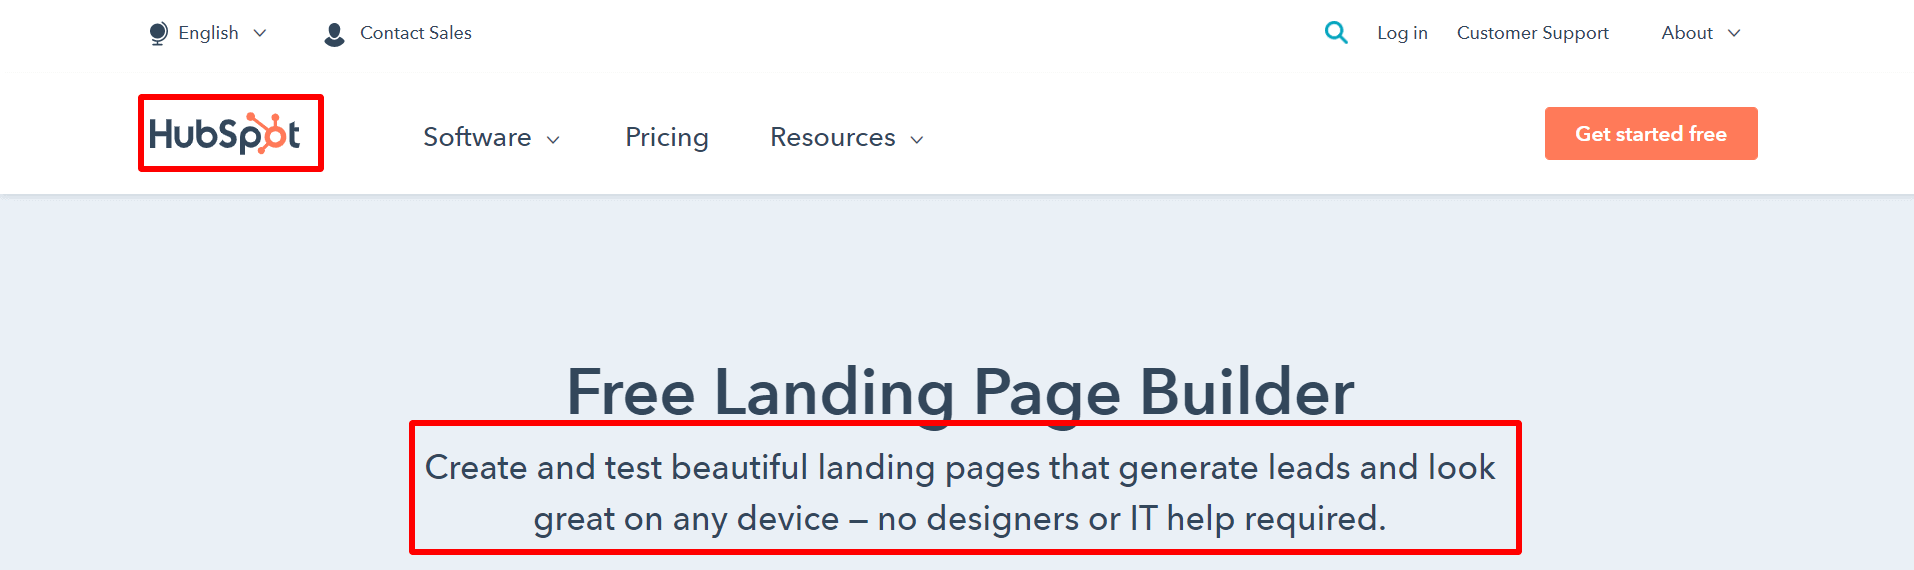 Free-Landing-Page-Builder-HubSpot